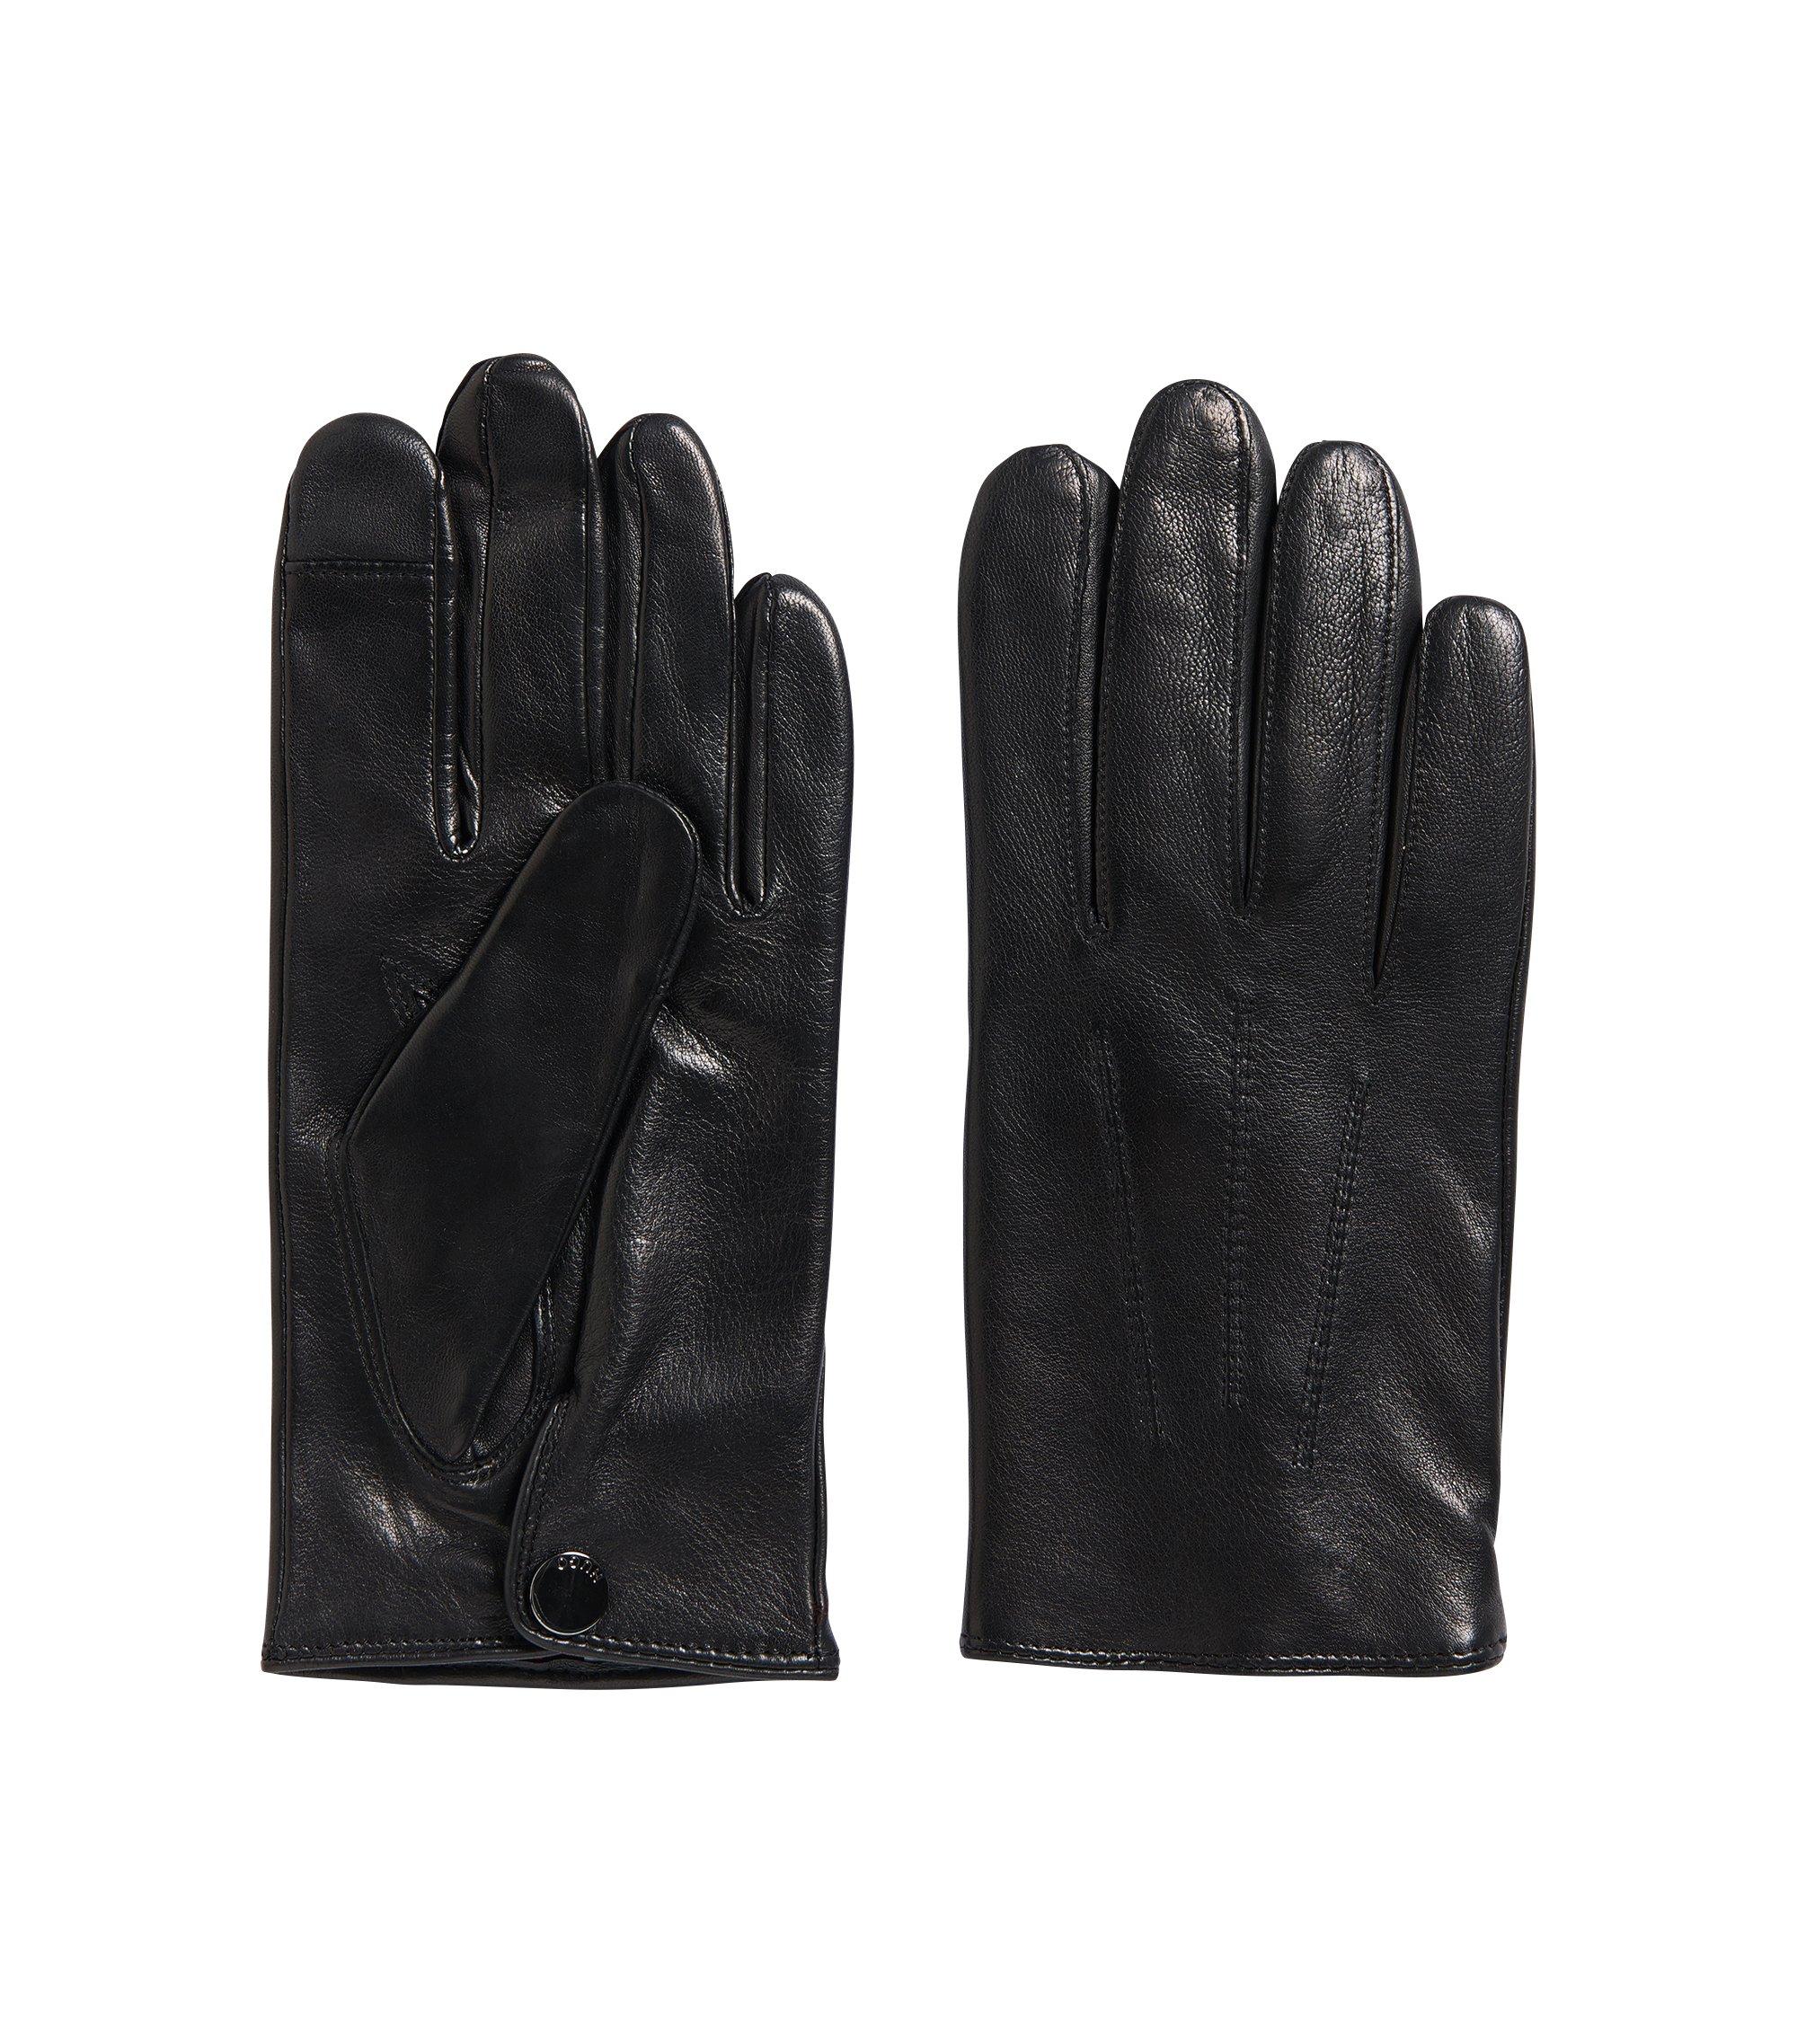 Touchscreen-Handschuhe aus Nappaleder mit Innenfutter aus Kaschmir, Schwarz